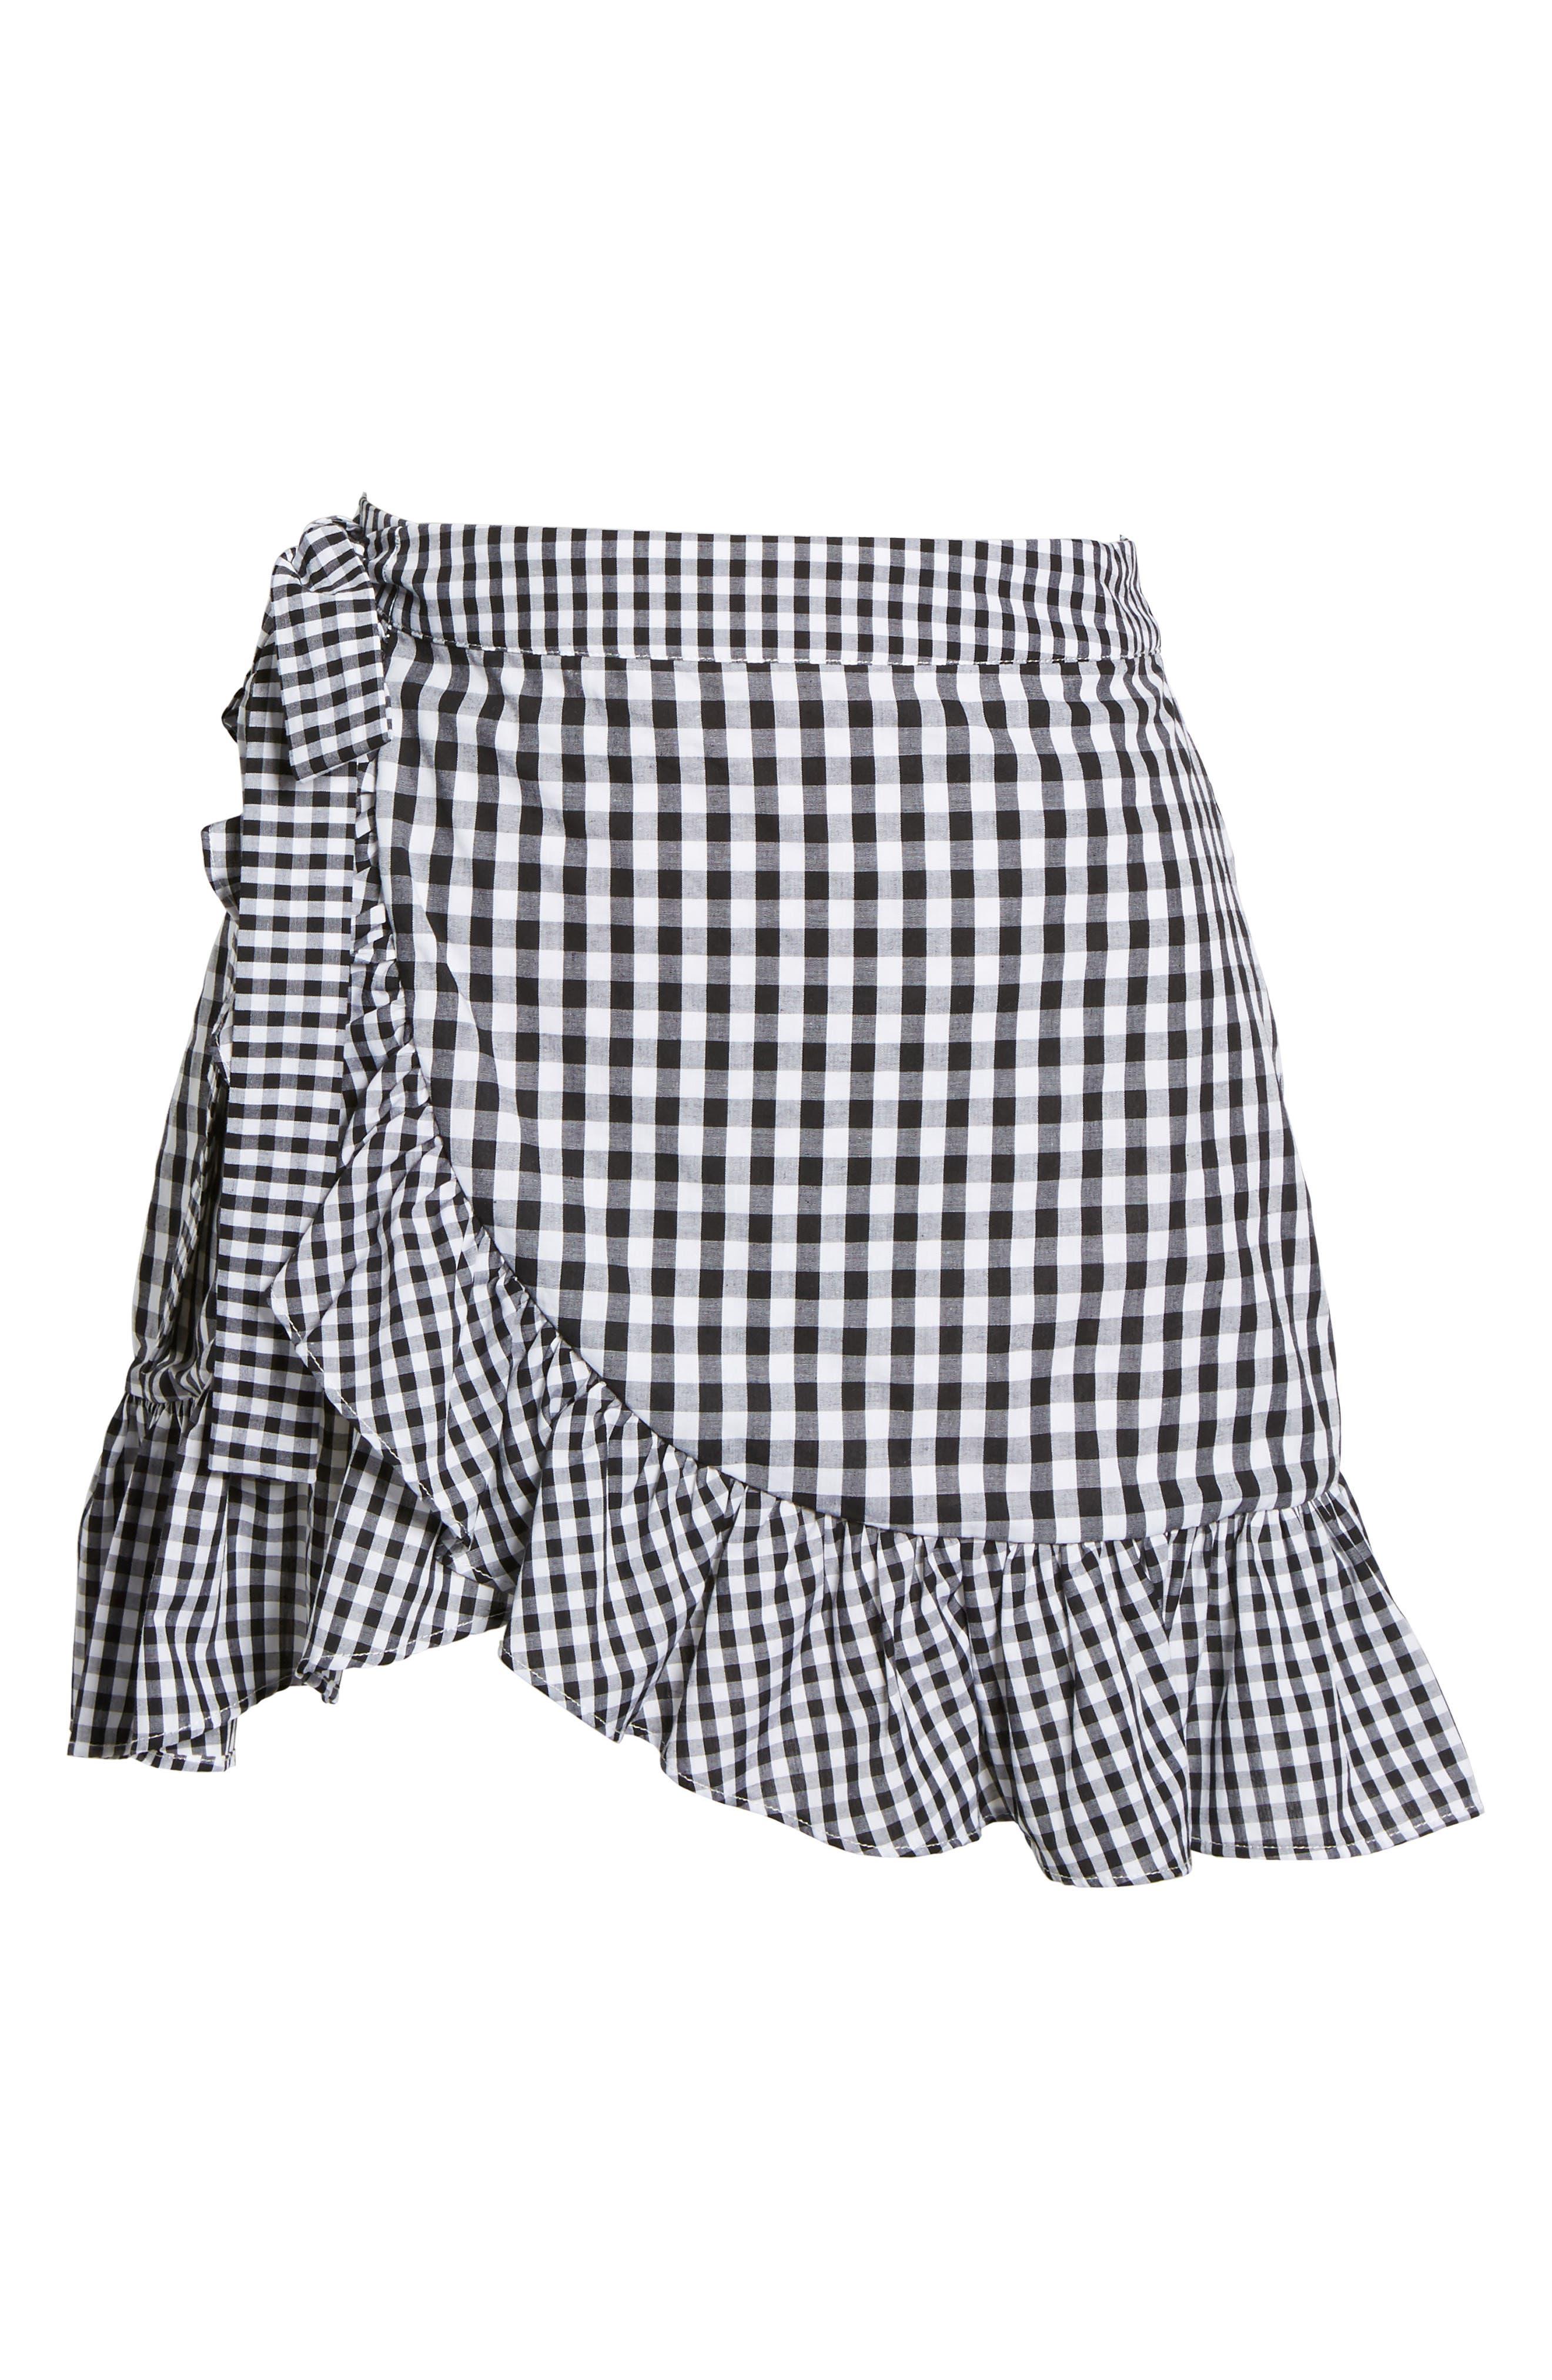 Cinci Wrap Skirt,                             Alternate thumbnail 6, color,                             Black/ White